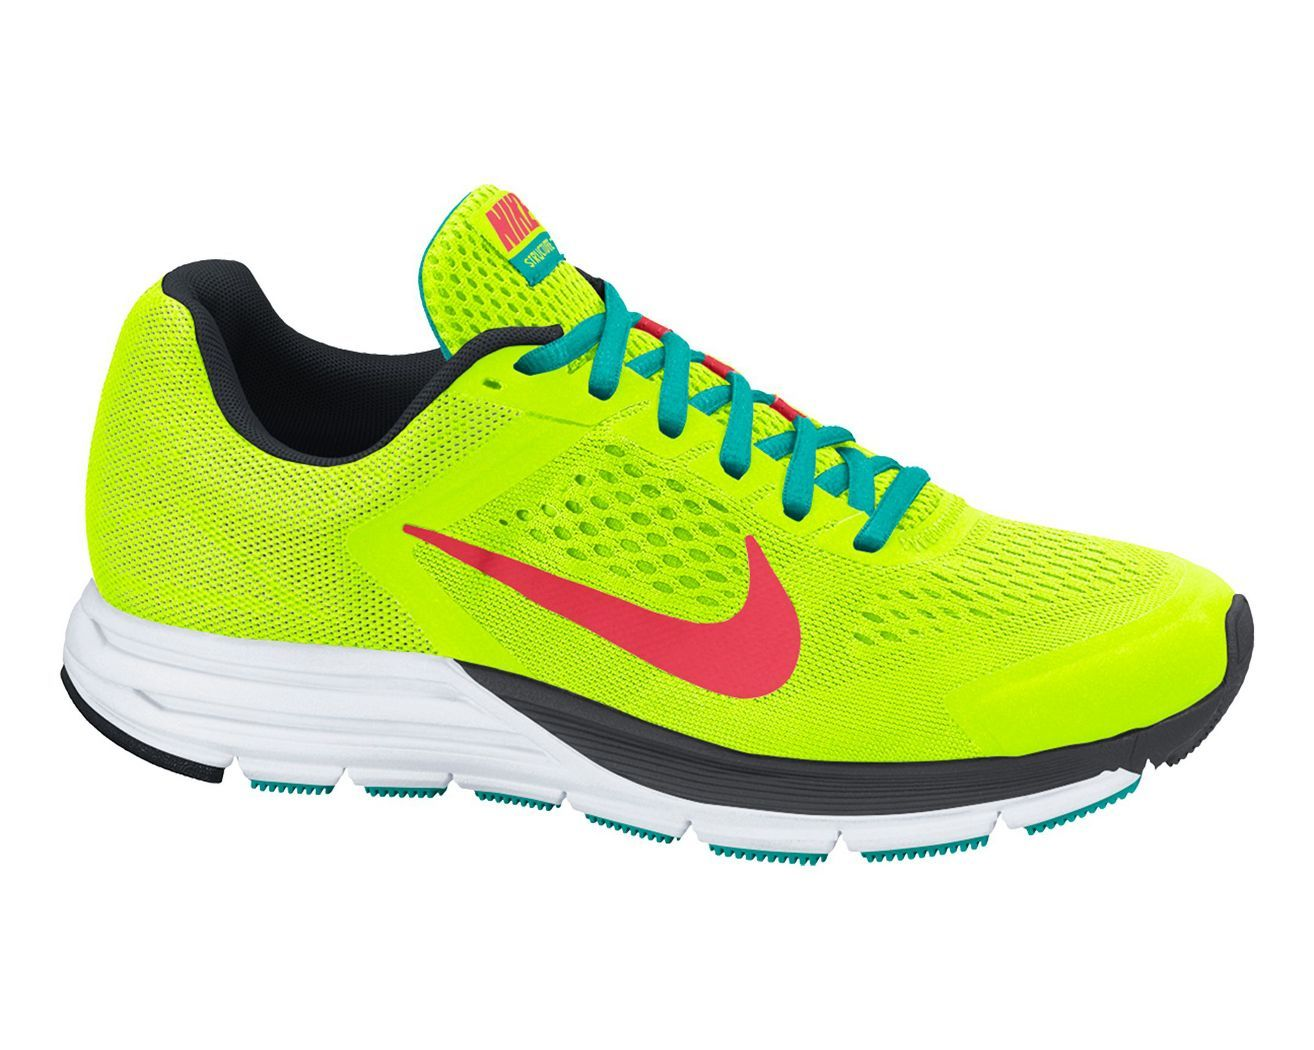 027f6b73c287 Women s Nike Zoom Structure+ 17